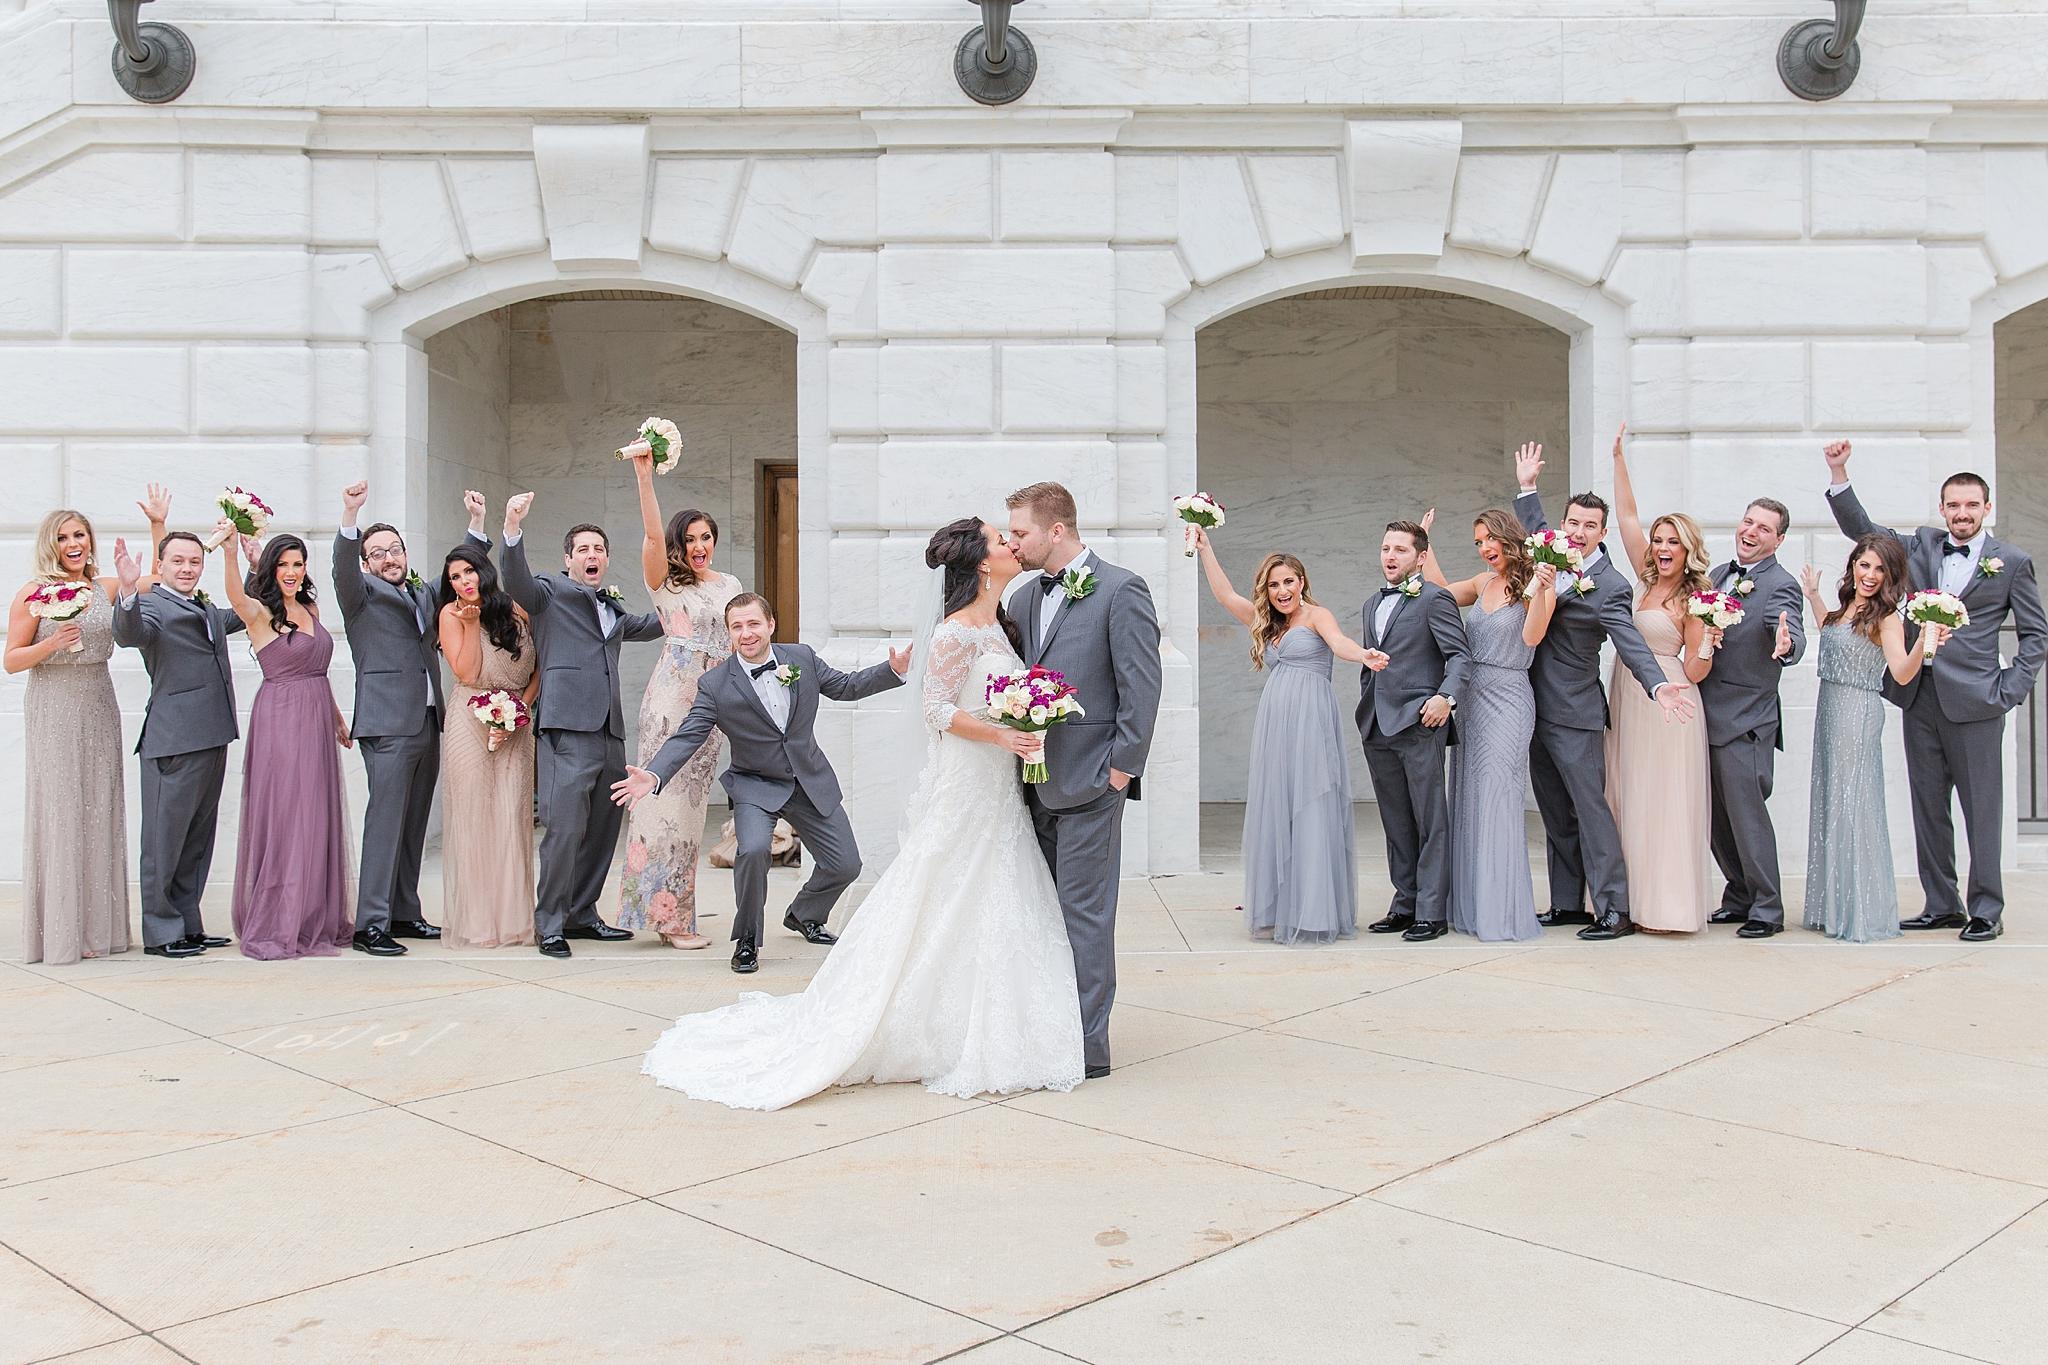 detroit-colony-club-wedding-regal-romantic-photography-in-detroit-mi-by-courtney-carolyn-photography_0015.jpg